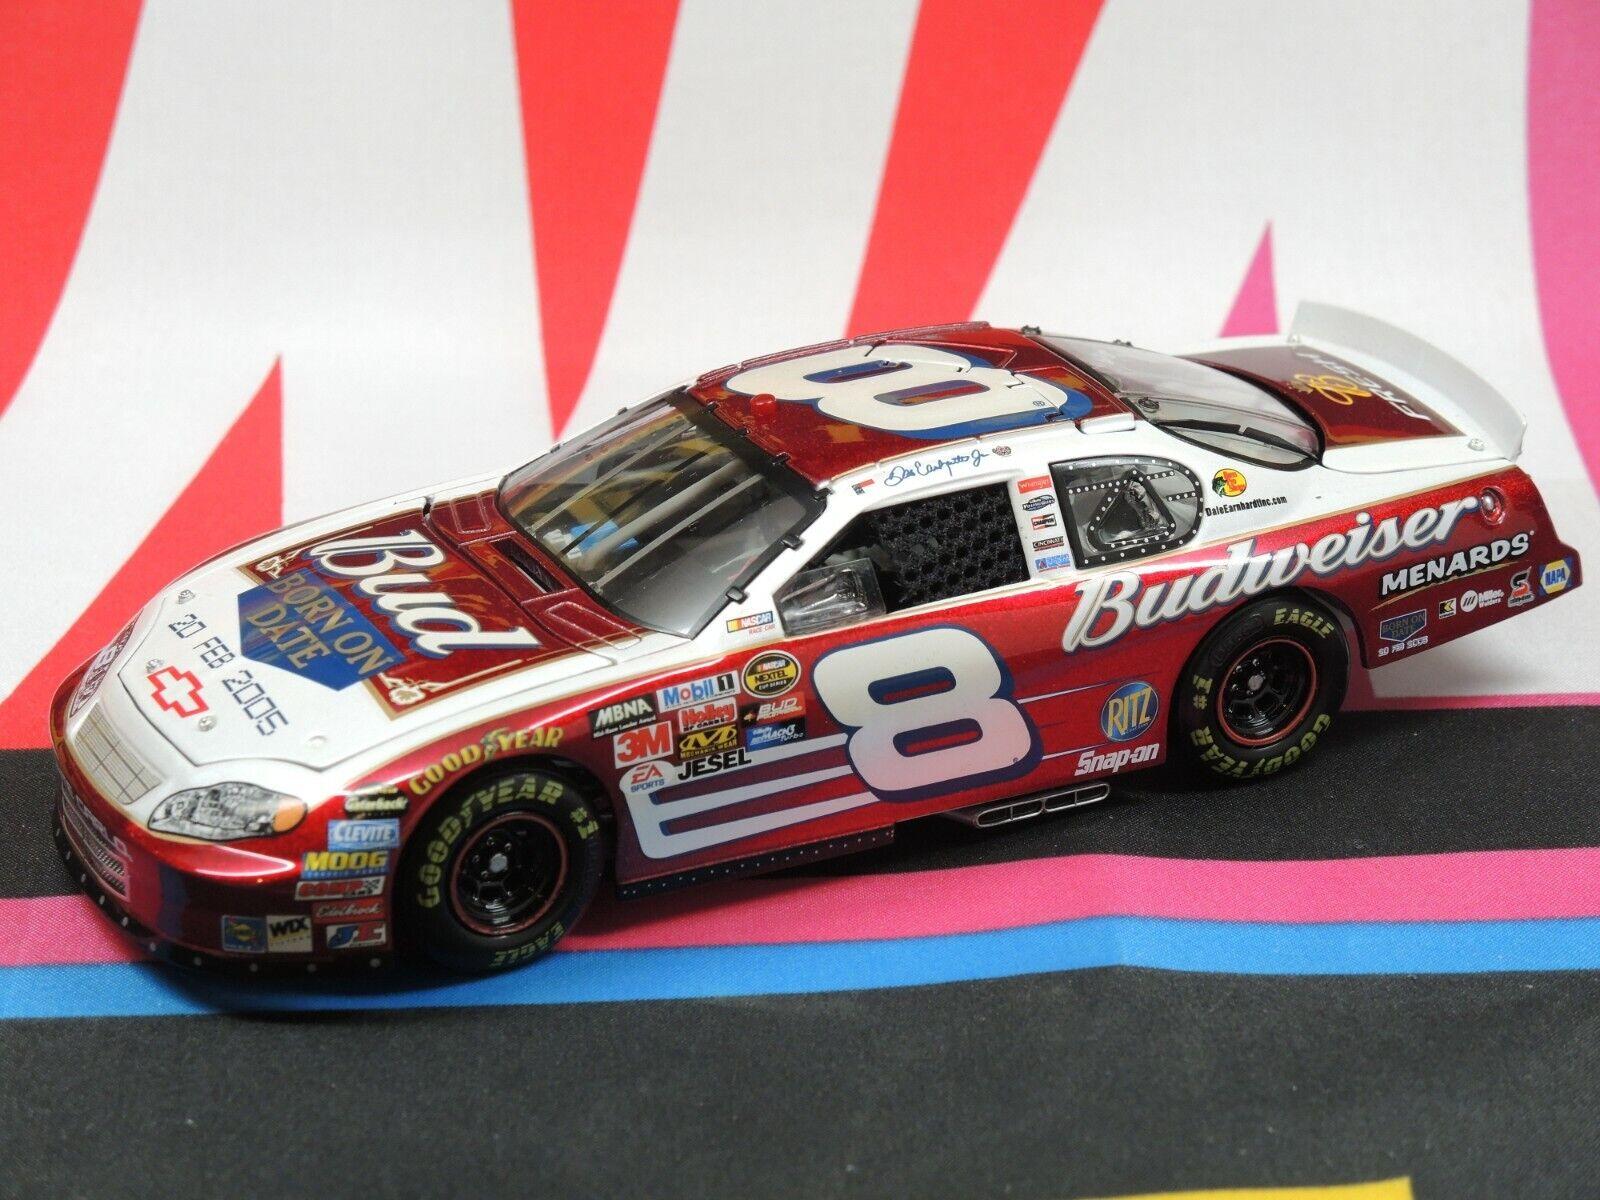 Dale Earnhardt Jr  8 Budweiser Daytona nacido en fecha 20 de febrero de 2005 1 24 Elite